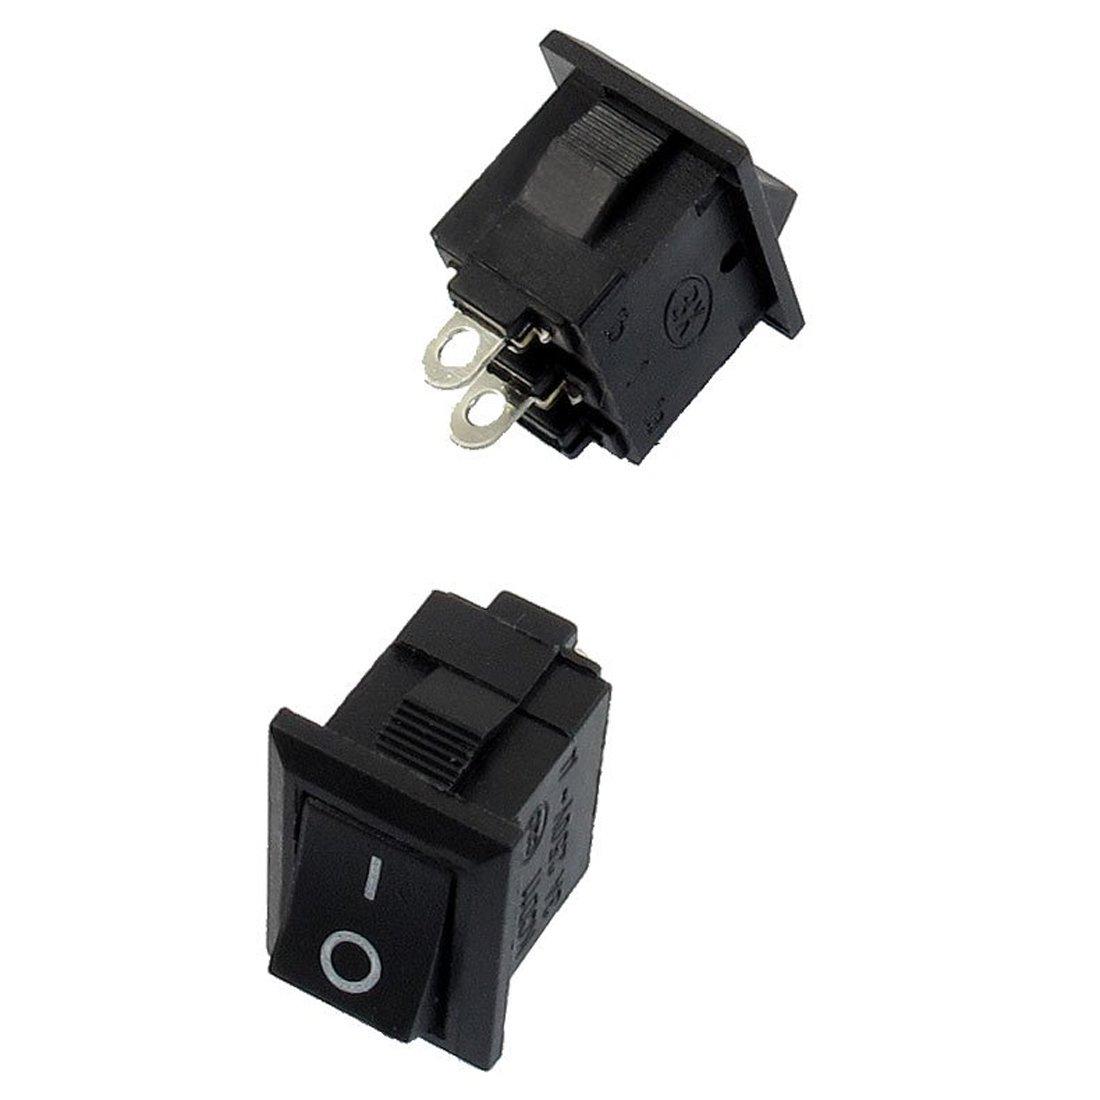 SODIAL(R) 10 Pcs SPST Mini Noir 2 broches interrupteur a bascule AC 125V 10A 250V 6A